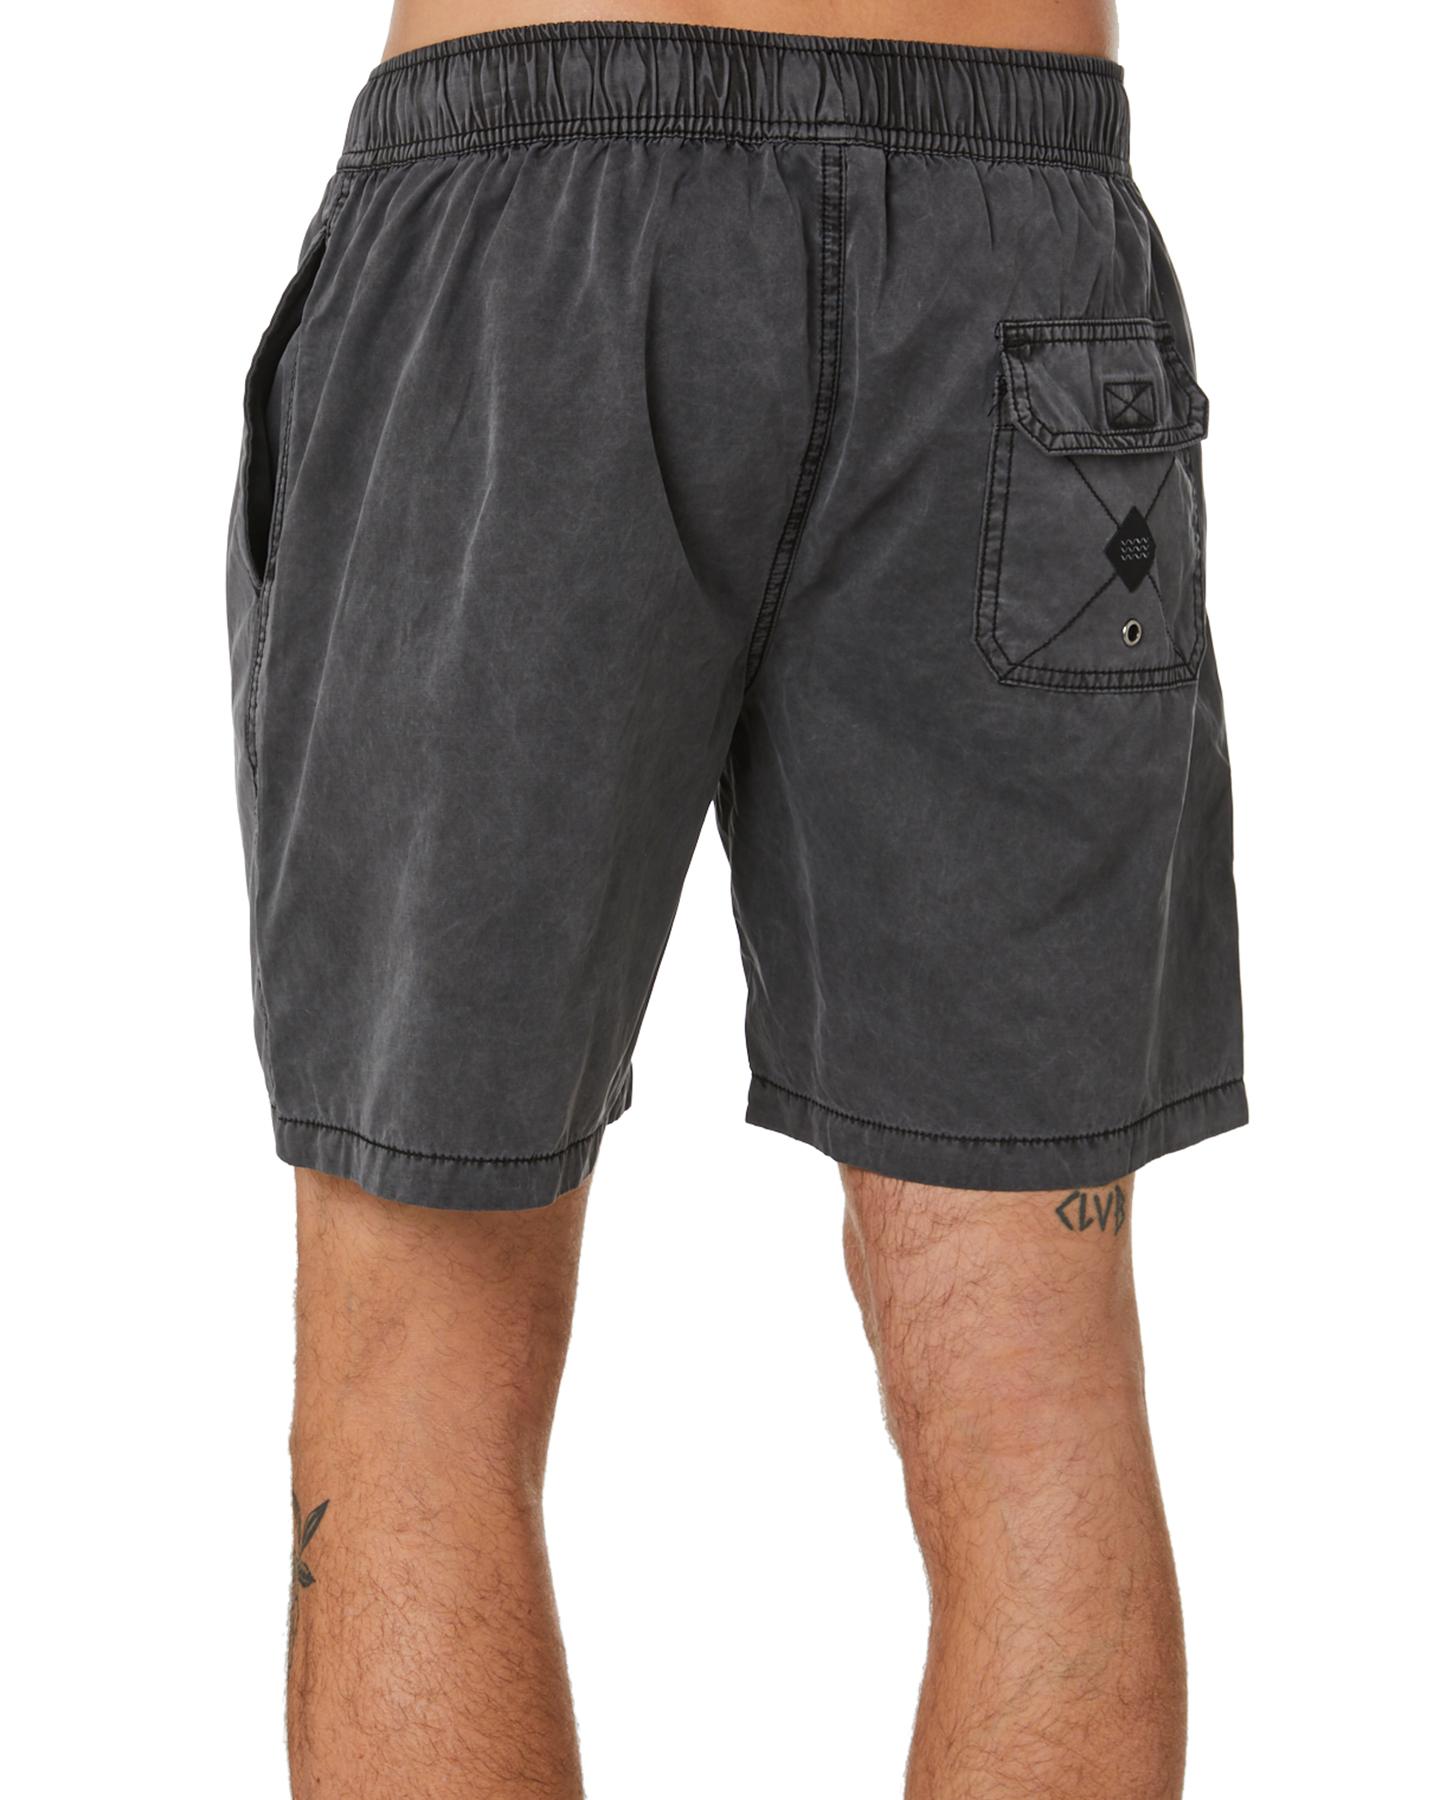 New-Swell-Men-039-s-Malibu-Mens-Beach-Short-Cotton-Polyester-Grey thumbnail 9